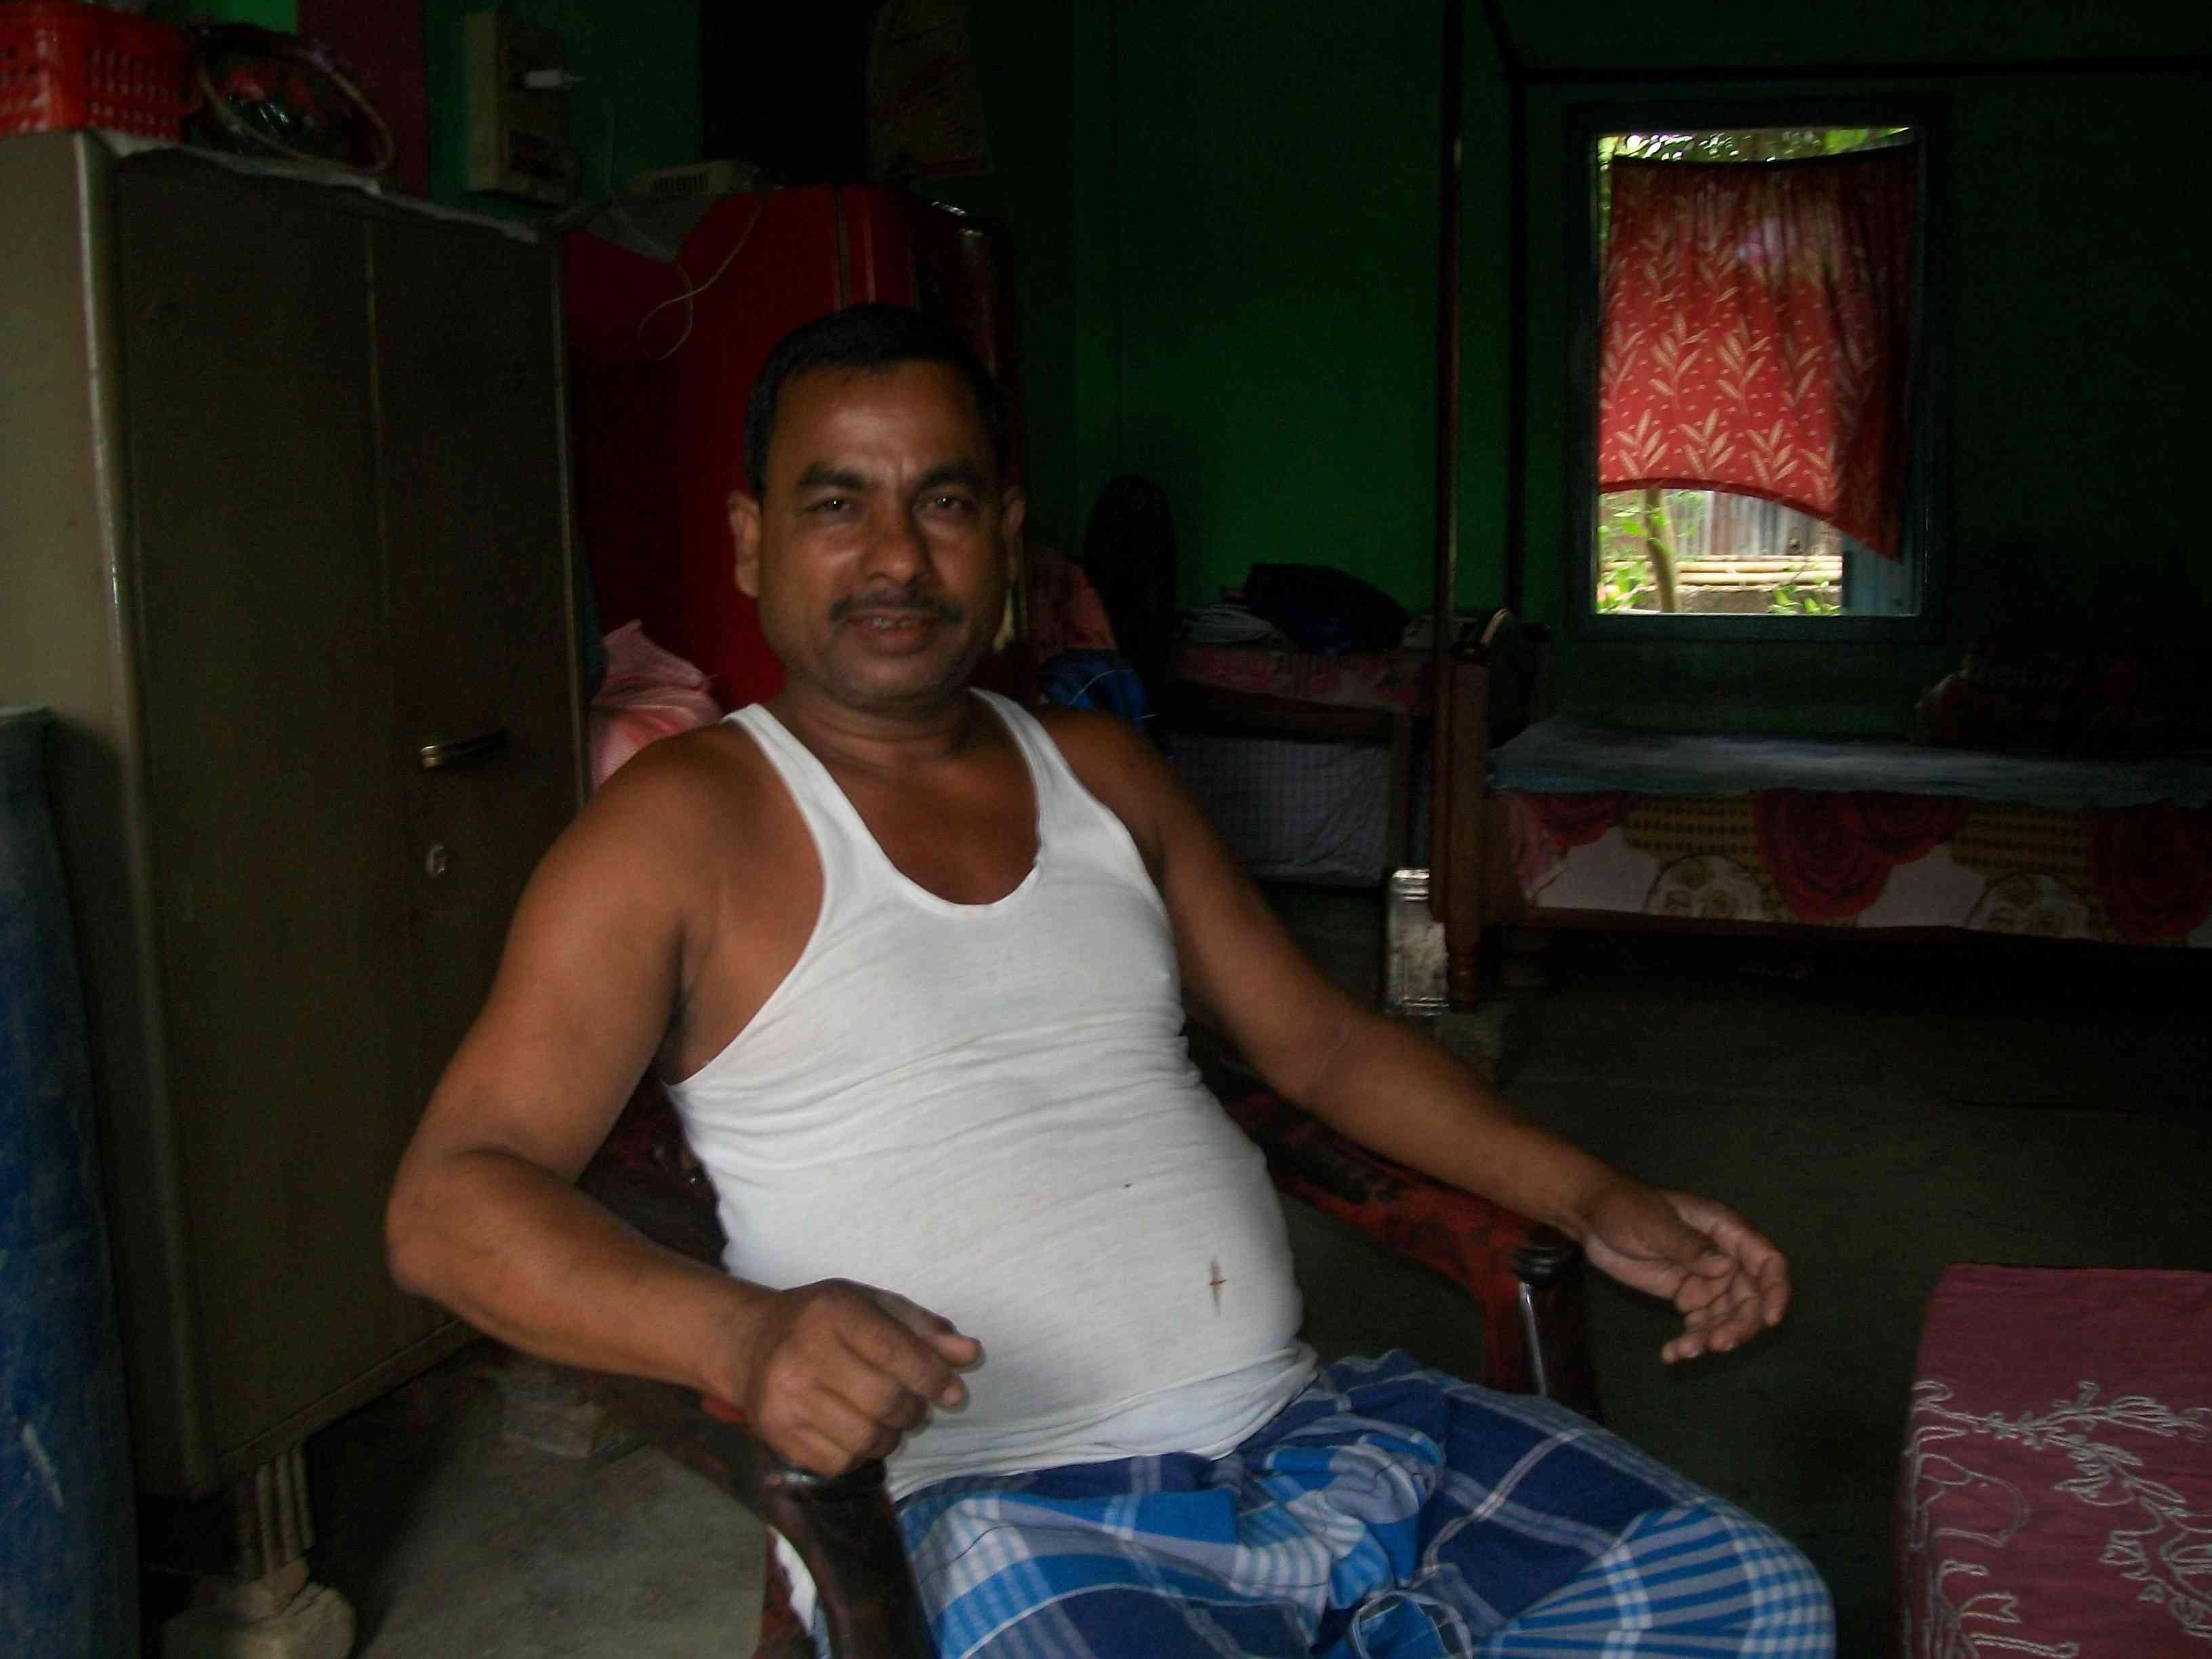 Patauddin Laskar says demonstrations by the Bajrang Dal have struck fear in the local Muslim community. (Photo credit: Ipsita Chakravarty).